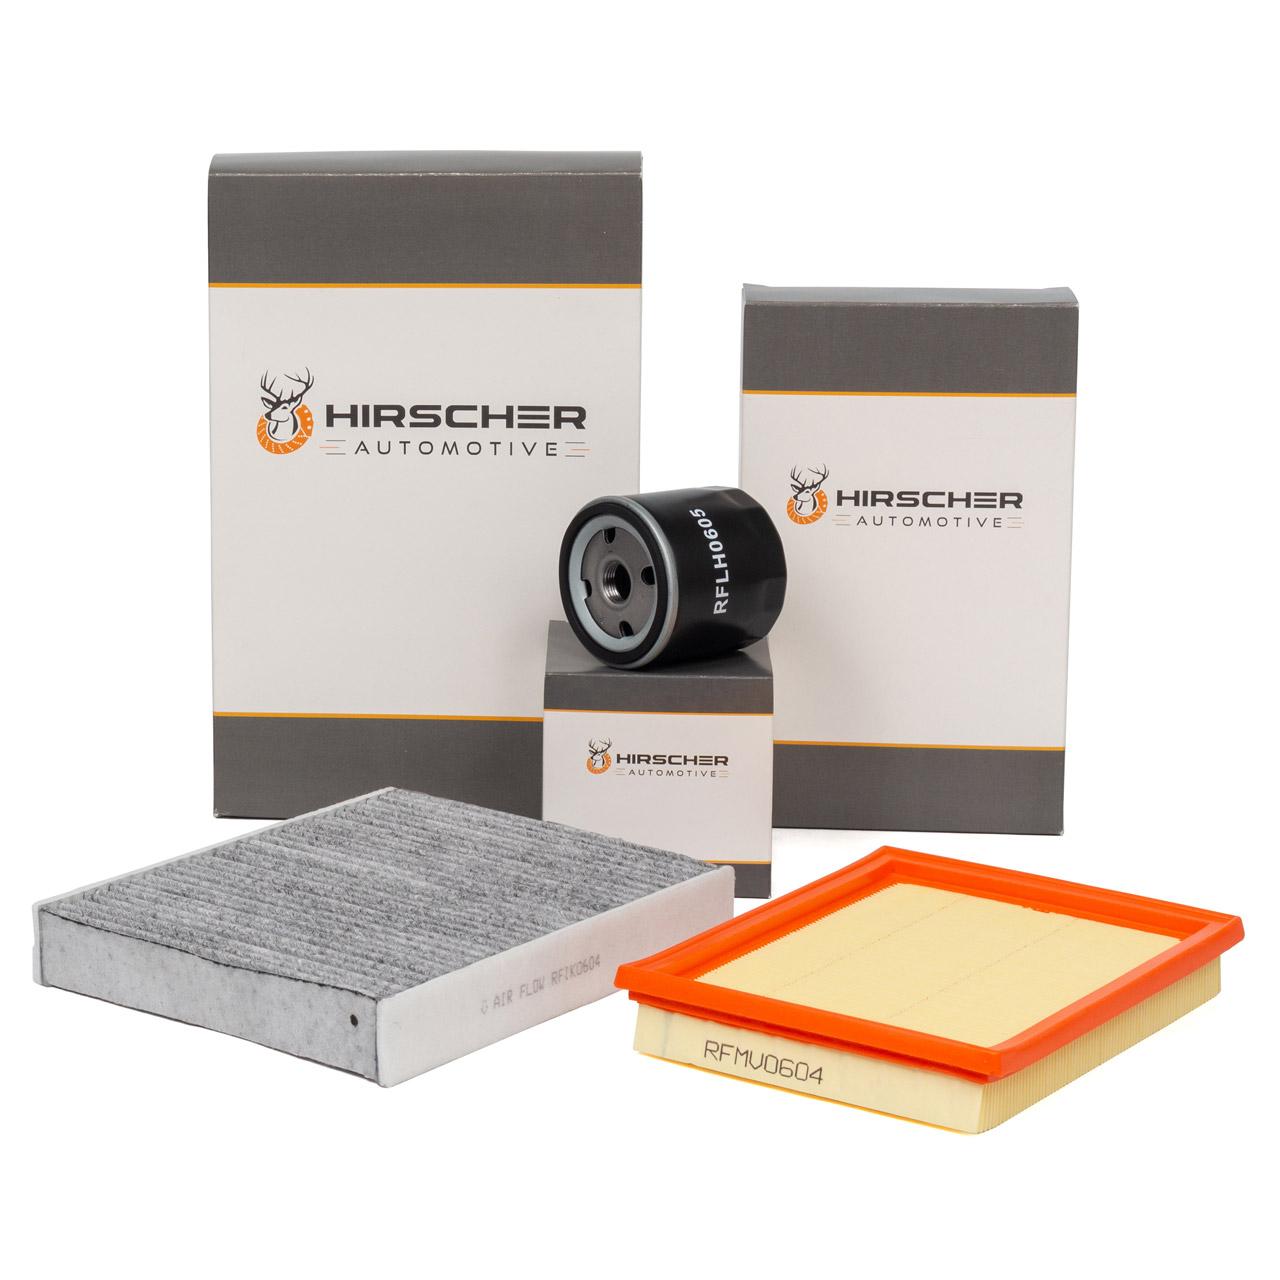 HIRSCHER Filterset FORD Fiesta 5 MK5 Fusion JU 1.25 16V + 1.4 16V + 1.6 16V